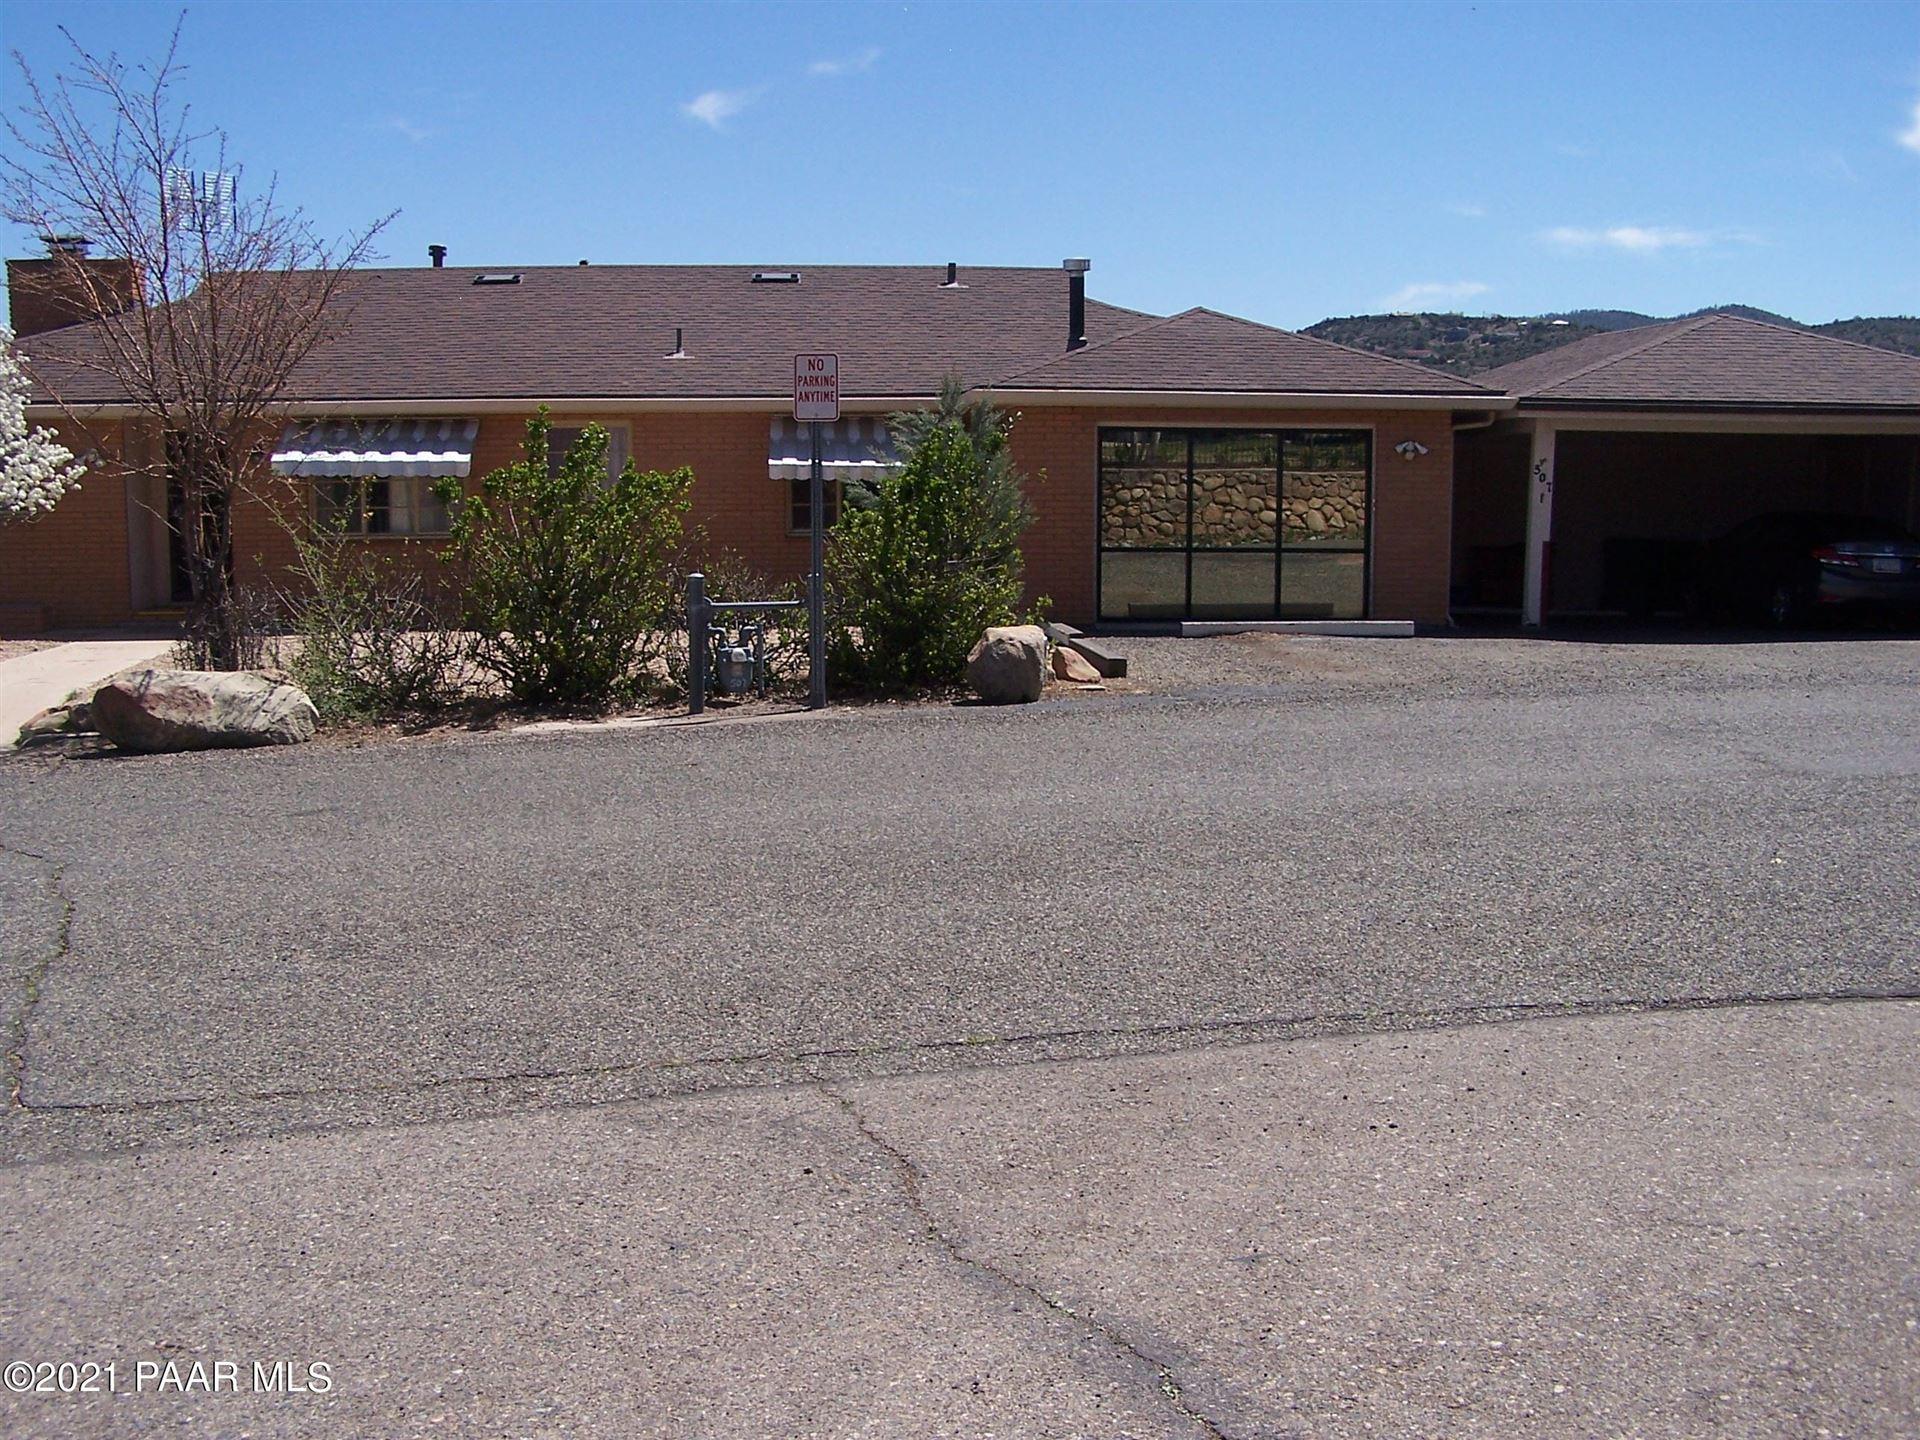 Photo of 507 S Hassayampa Drive #Lot: 20, Prescott, AZ 86303 (MLS # 1037611)